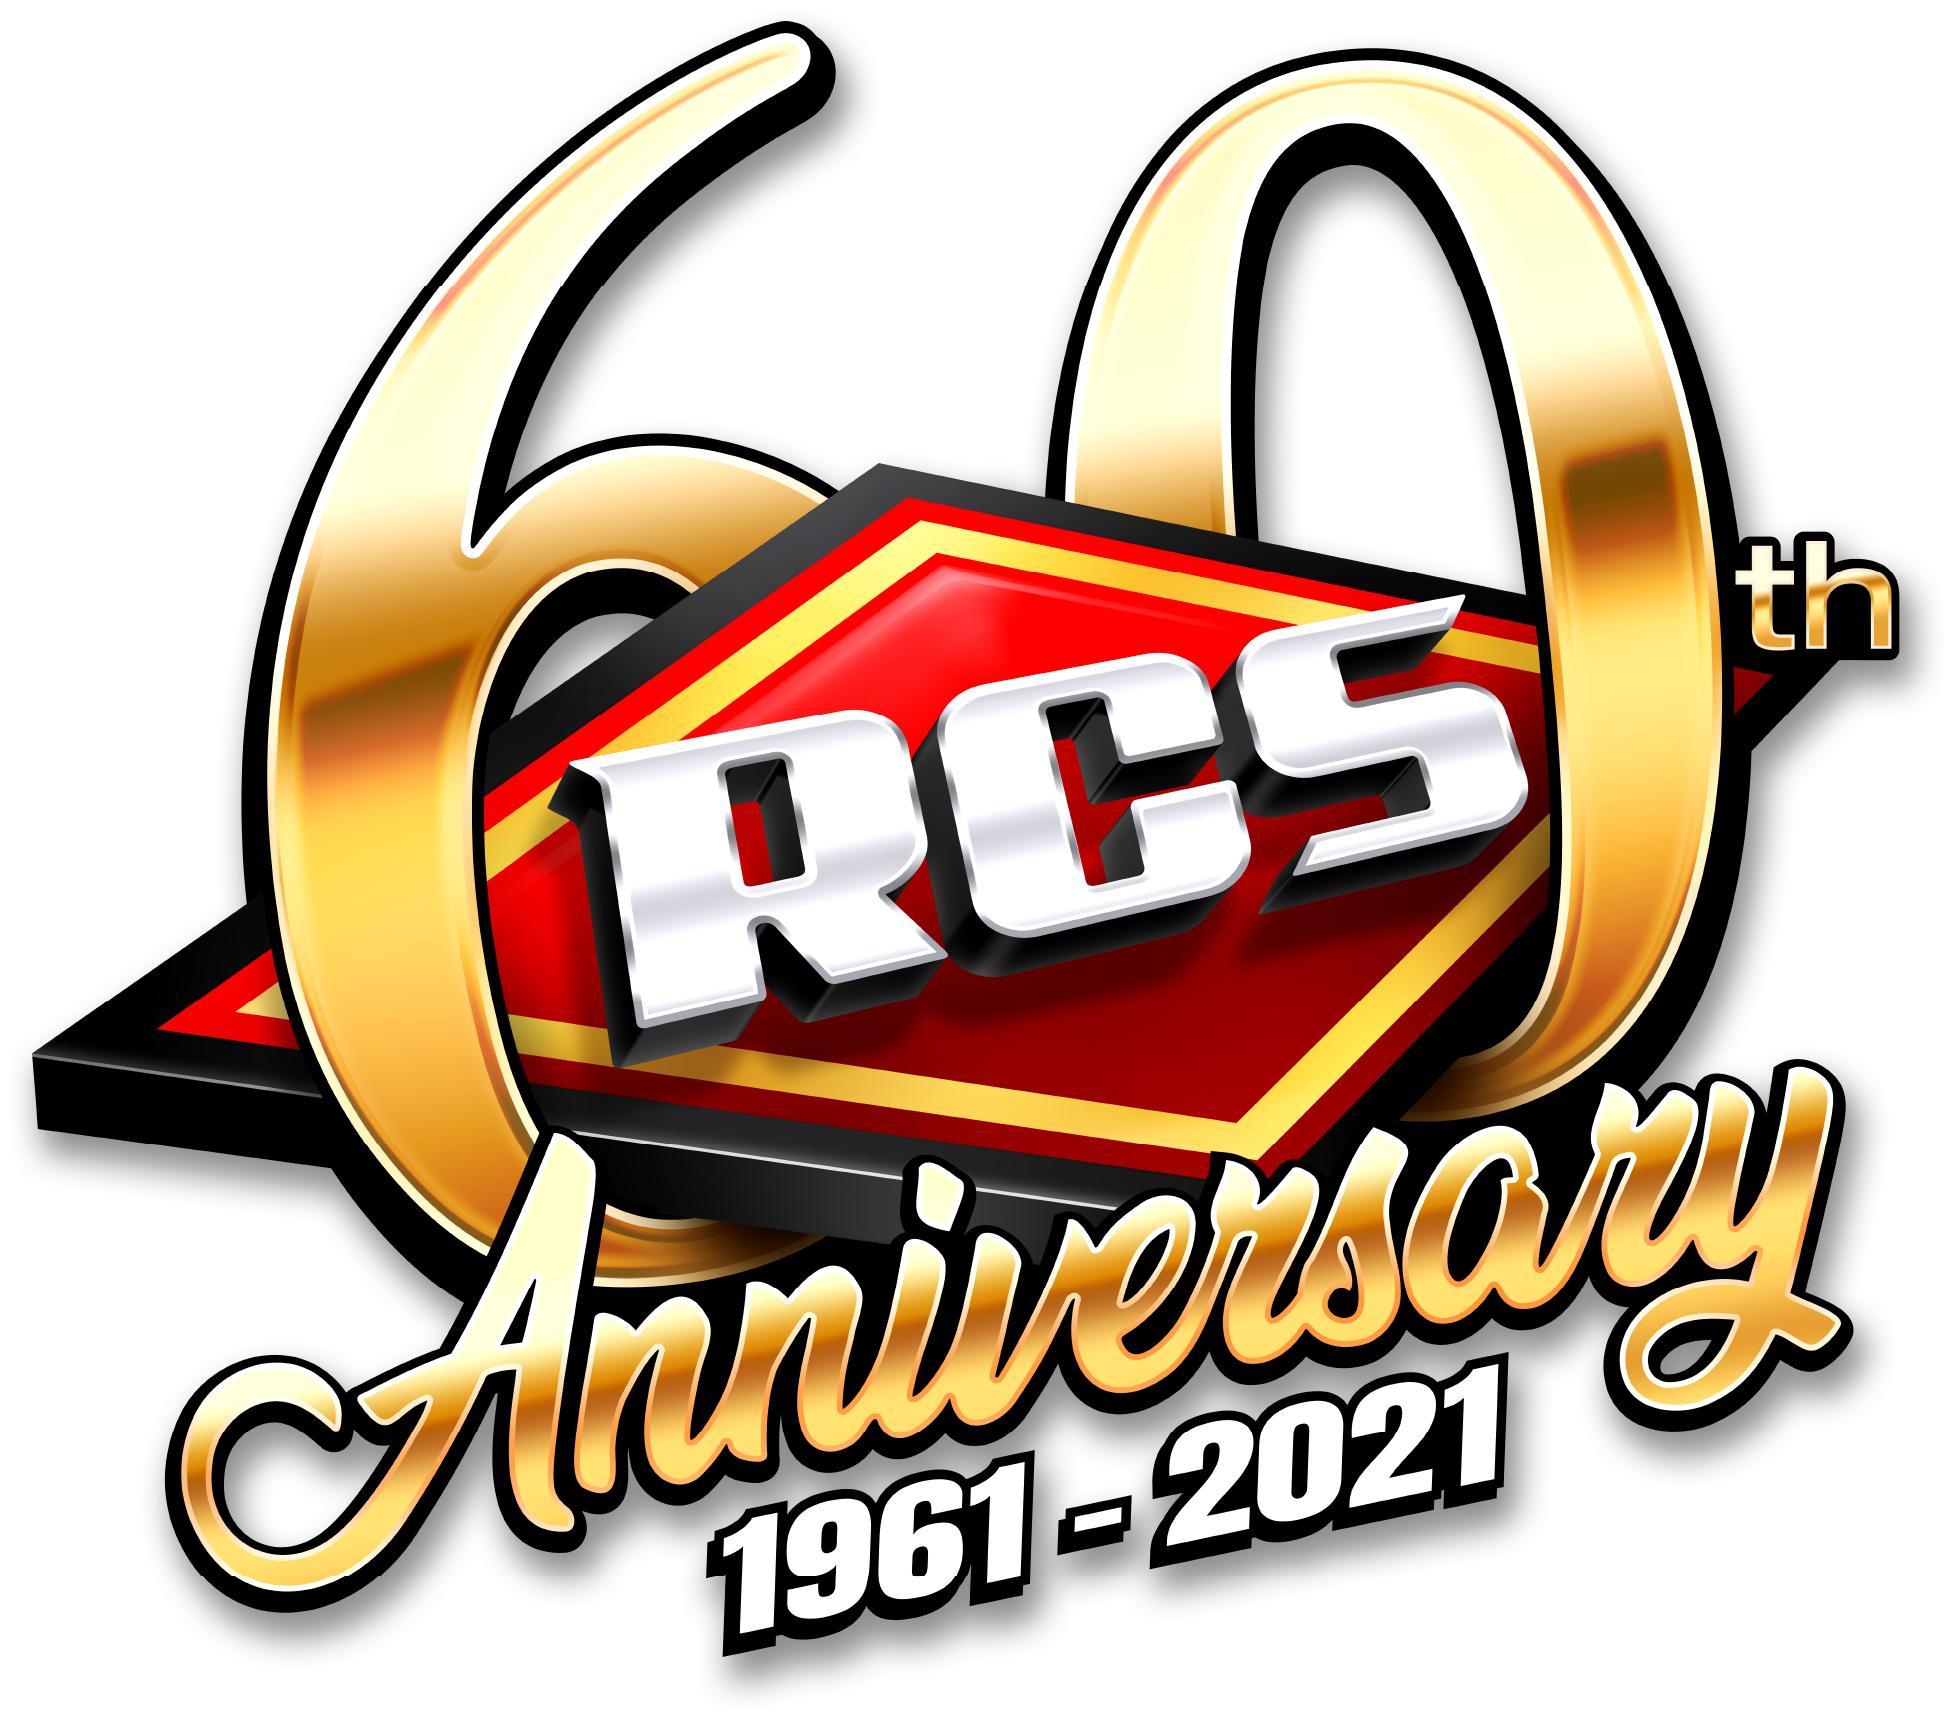 Rcsfun 60th Year Anniversary Logo